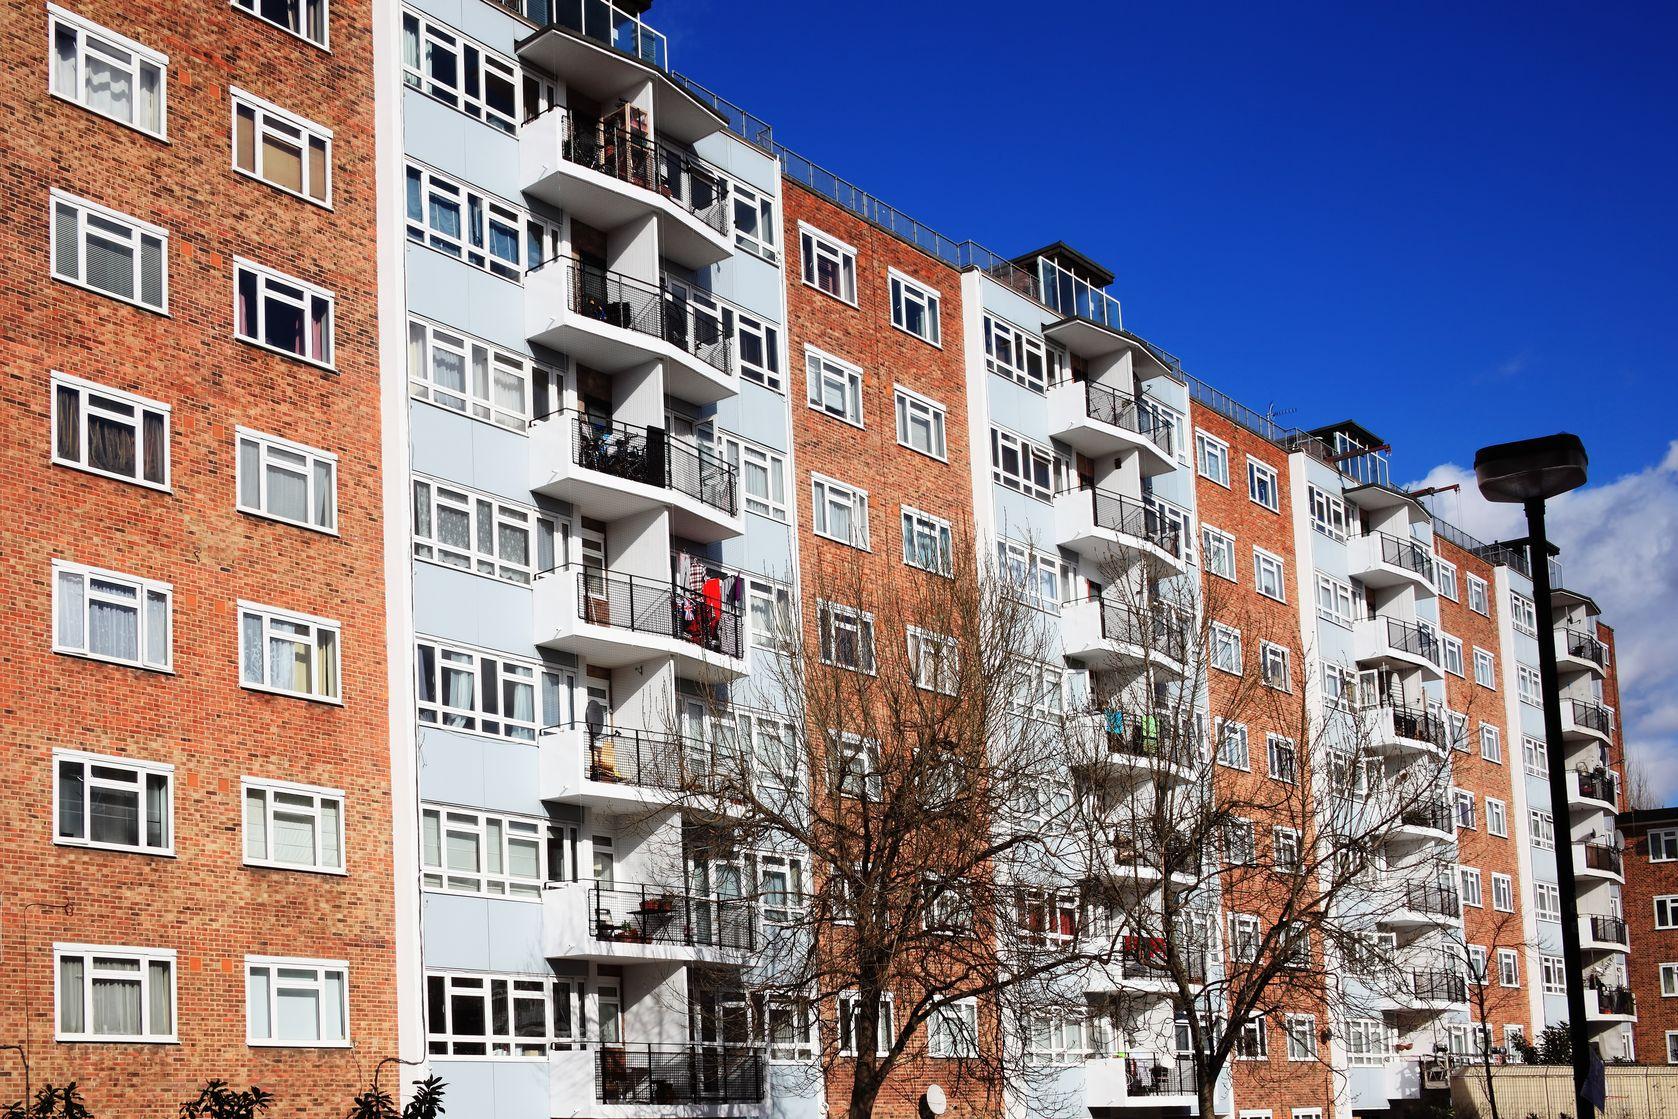 12768442 - public council housing apartments in london, england, uk